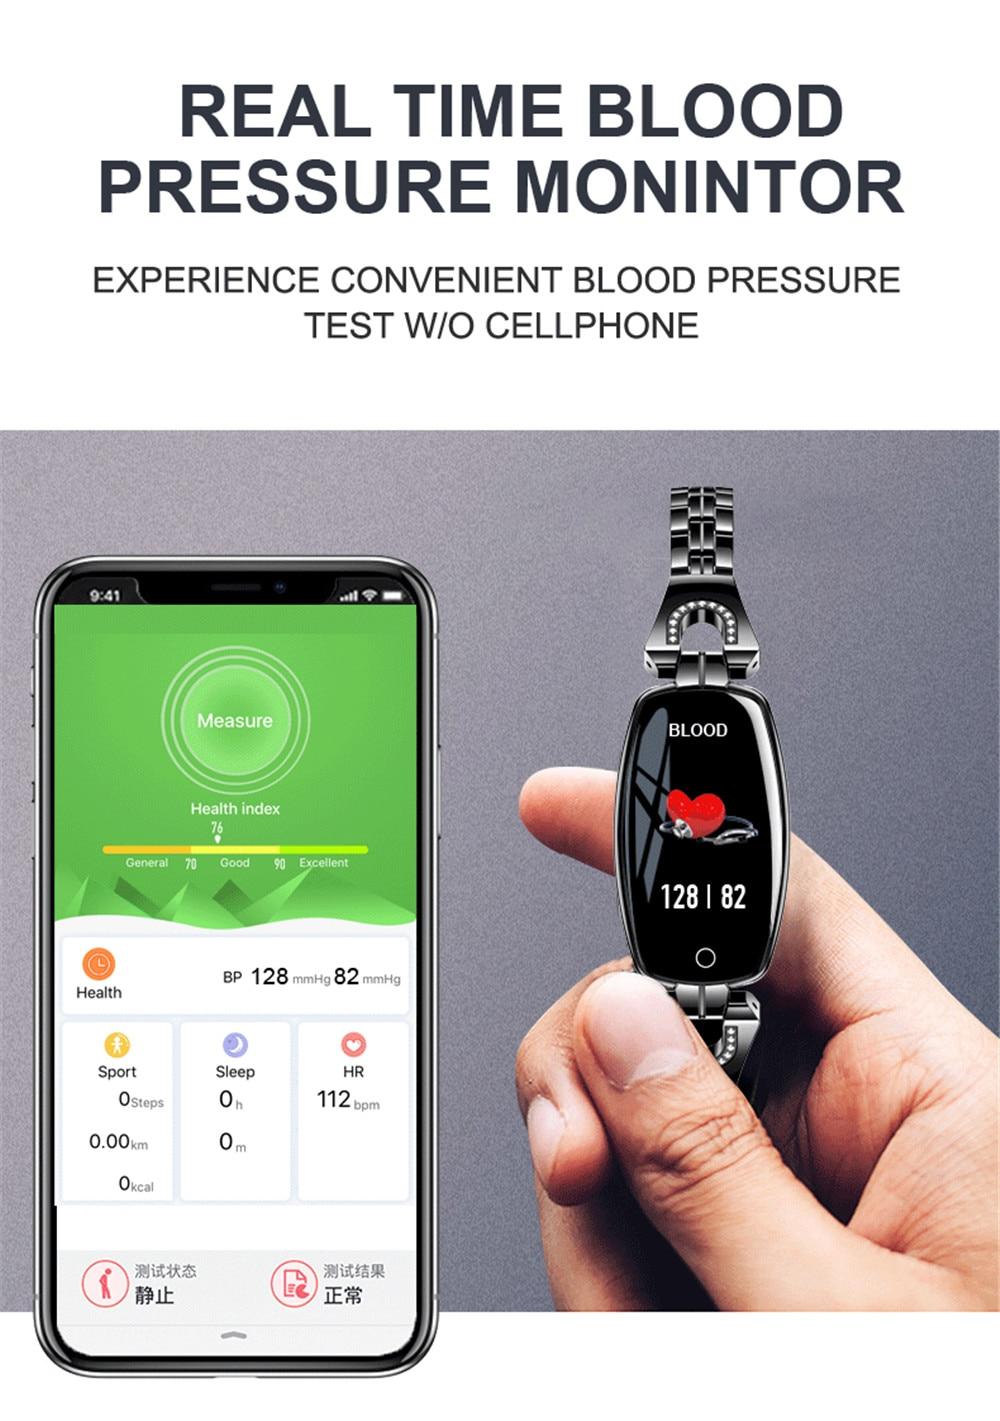 H3fe65bdce33b4b539621bbed419a79495 Greentiger H8 Smart Bracelet Women Activity Fitness Tracker Heart Rate Monitor Blood Pressure IP67 Waterproof Smart Wristband